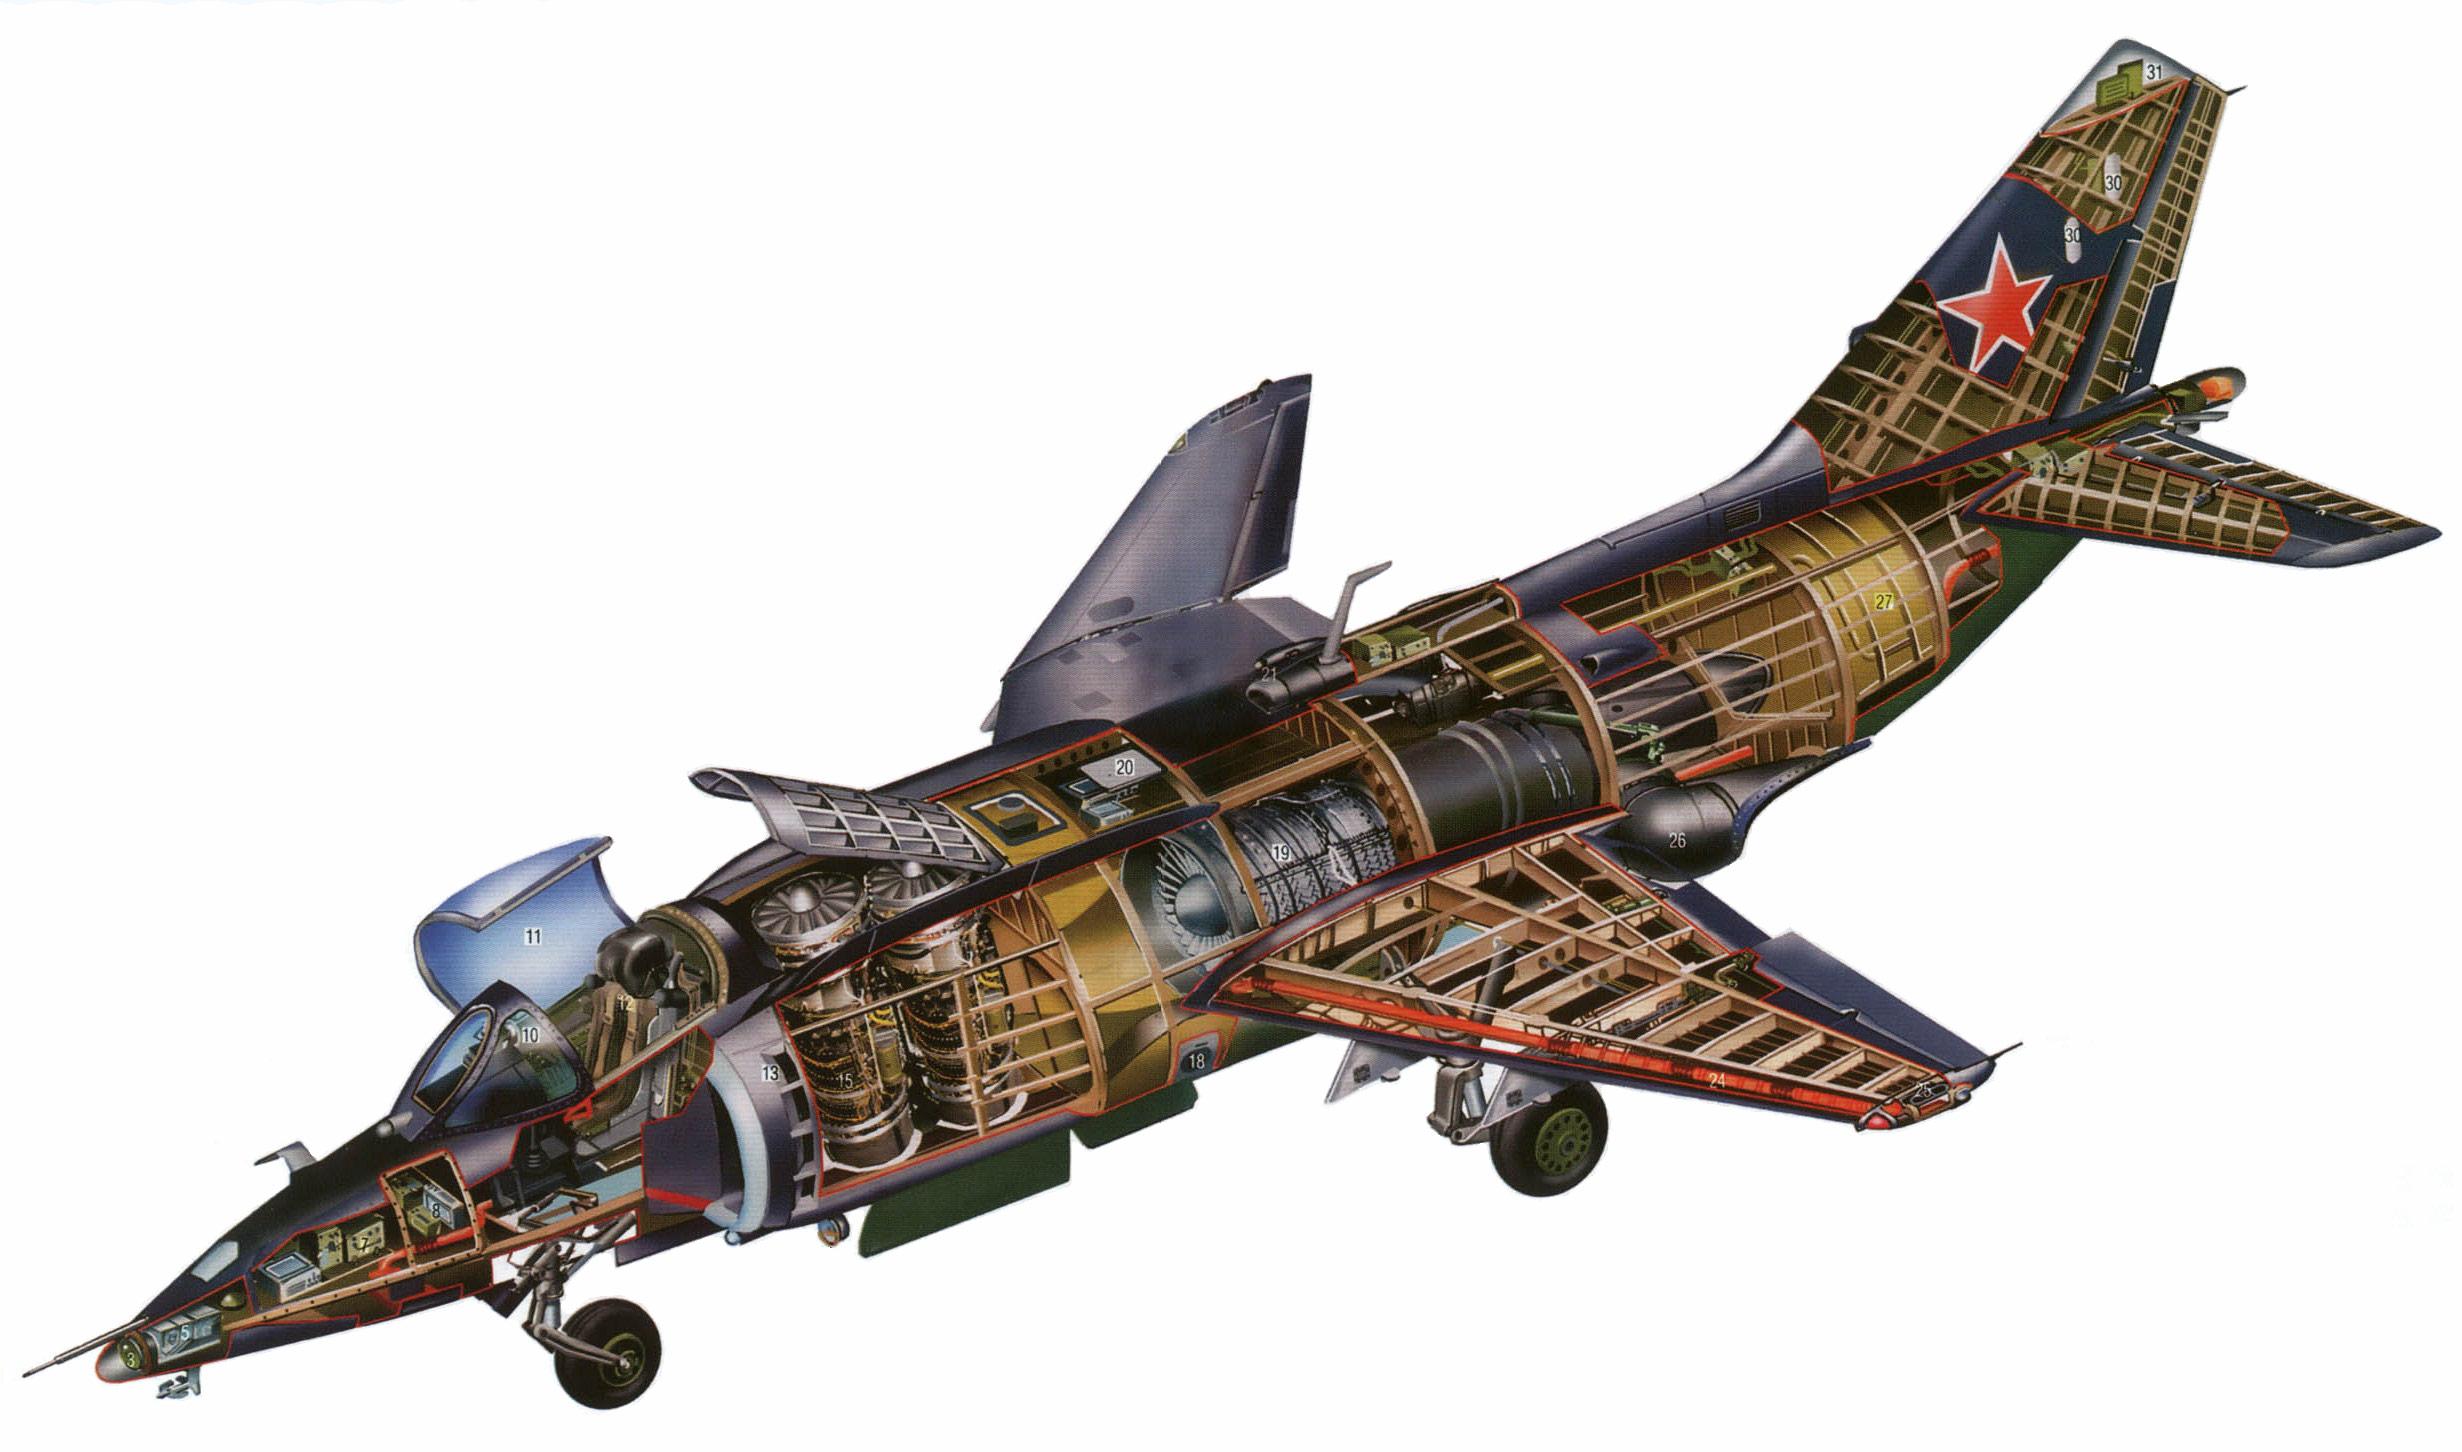 Yakovlev Yak-38 cutaway